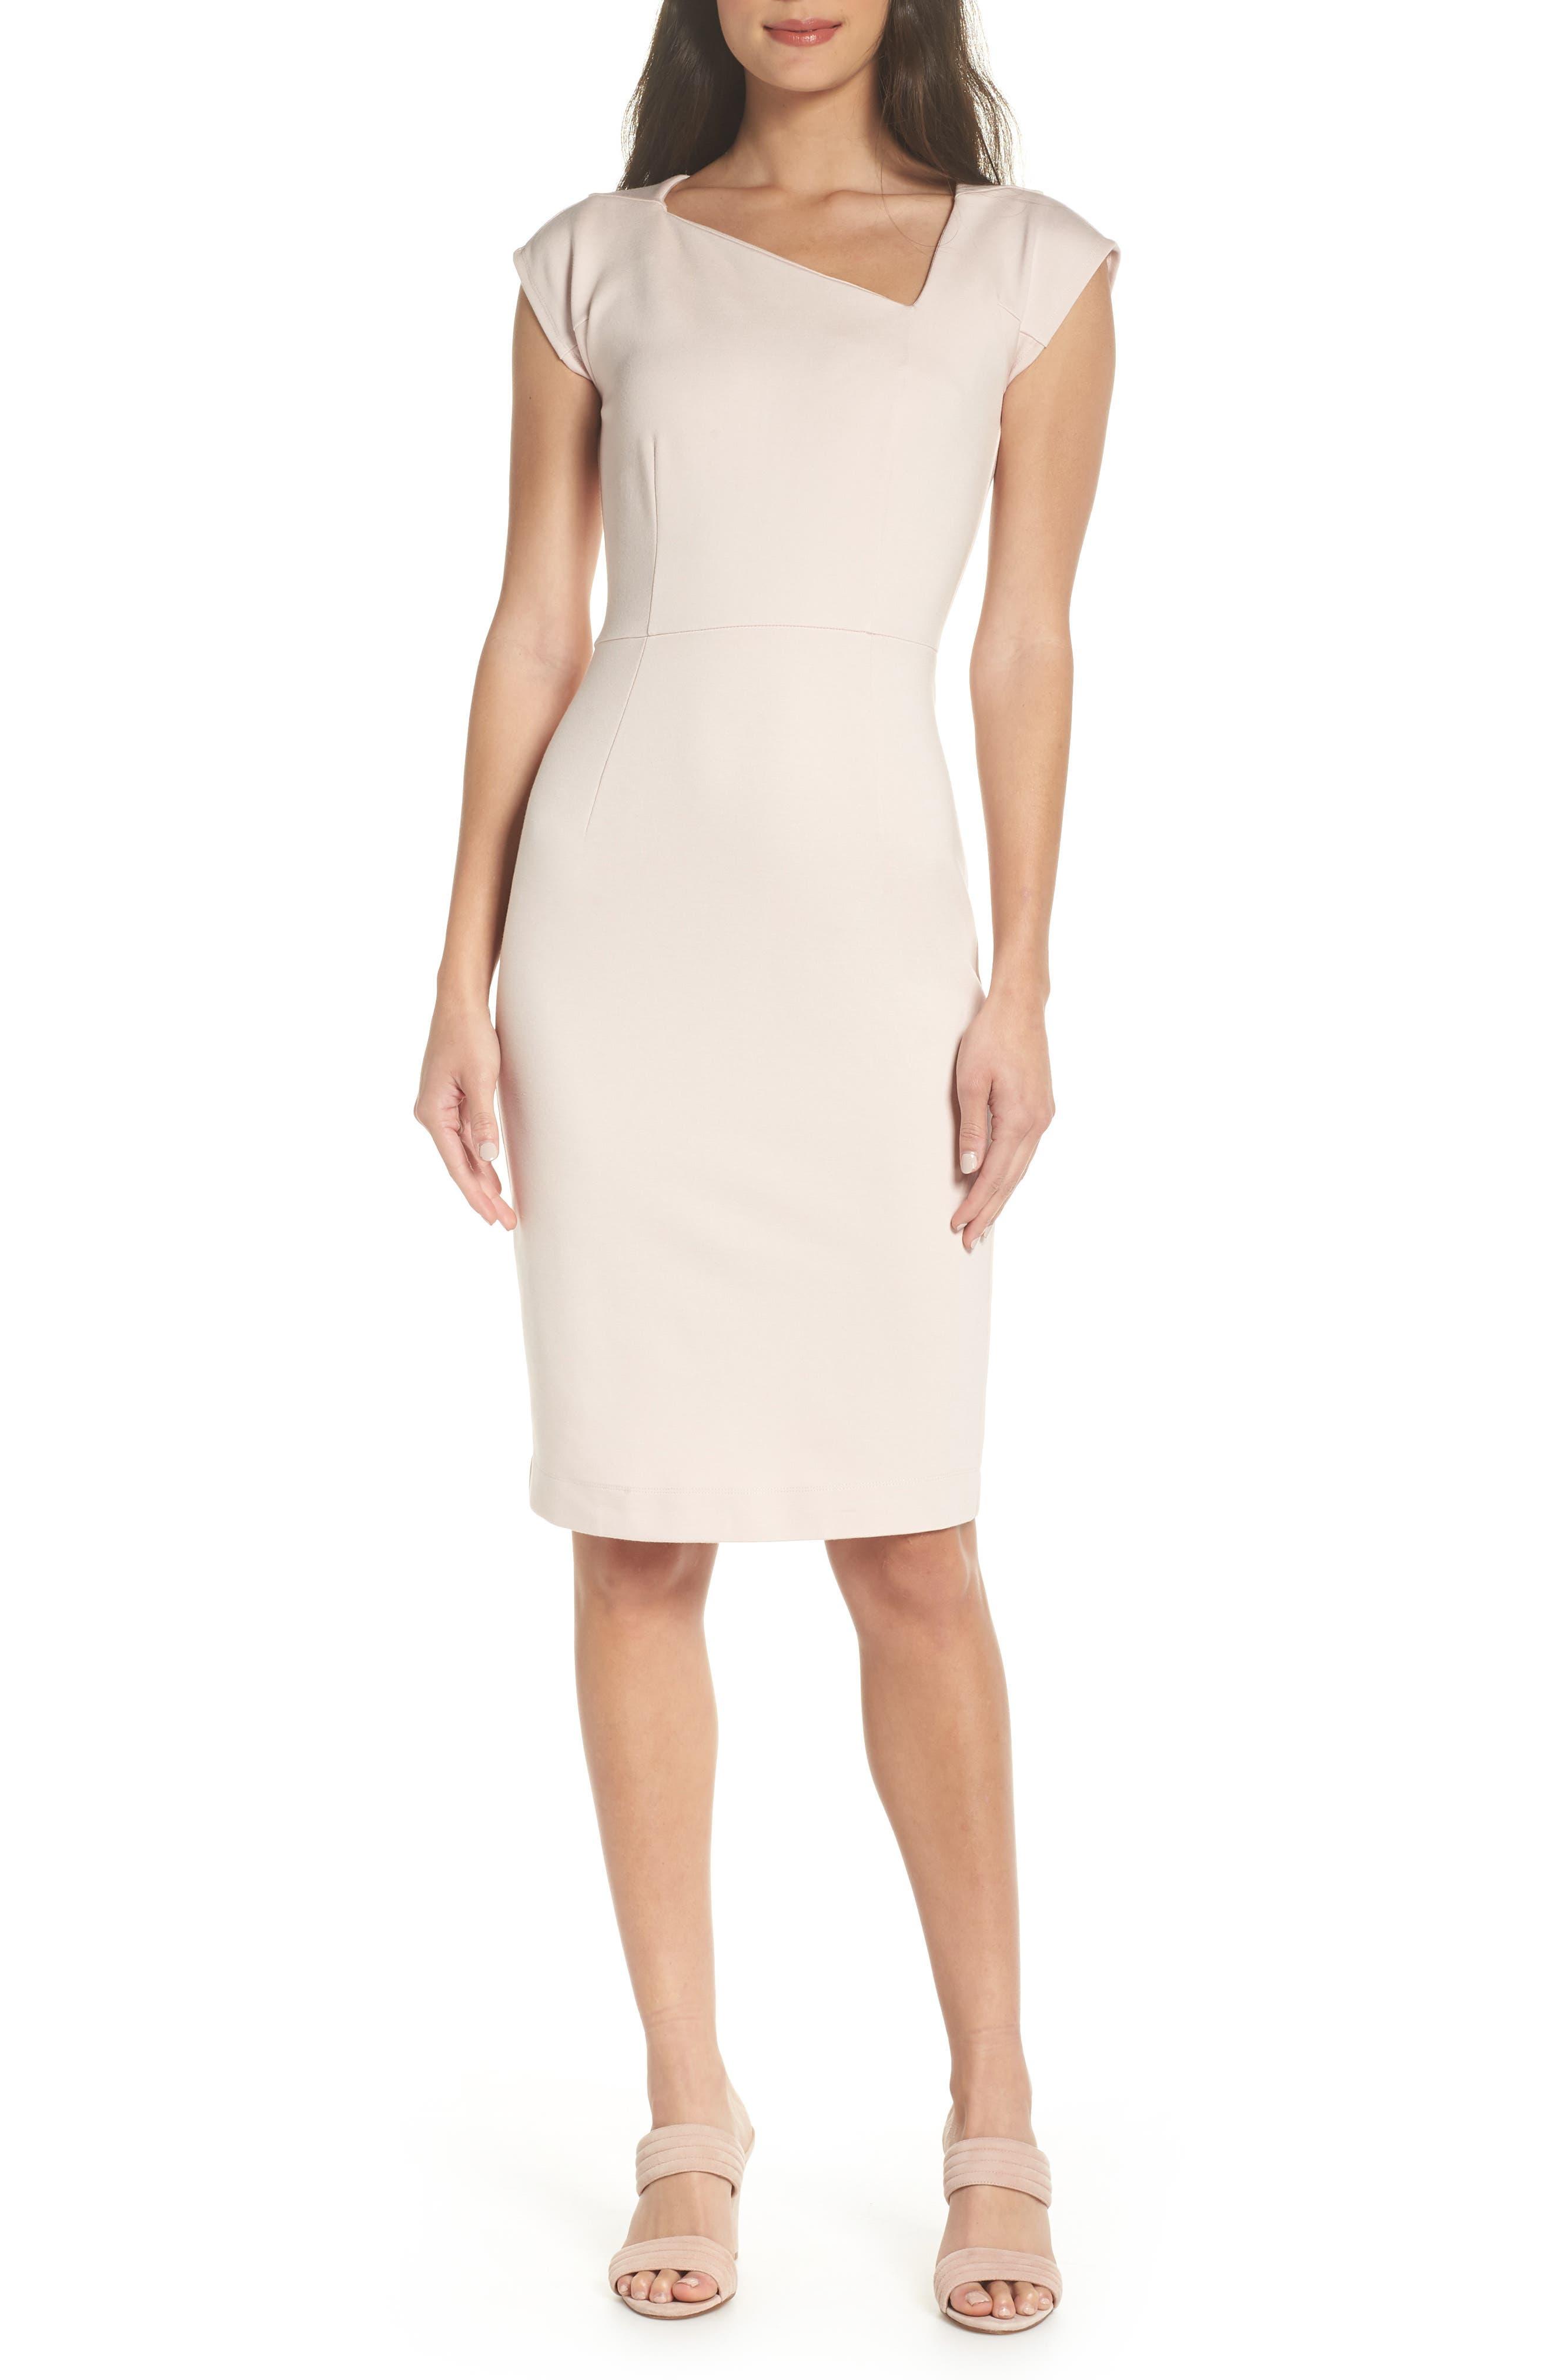 French Connection Lula Sheath Dress, Pink